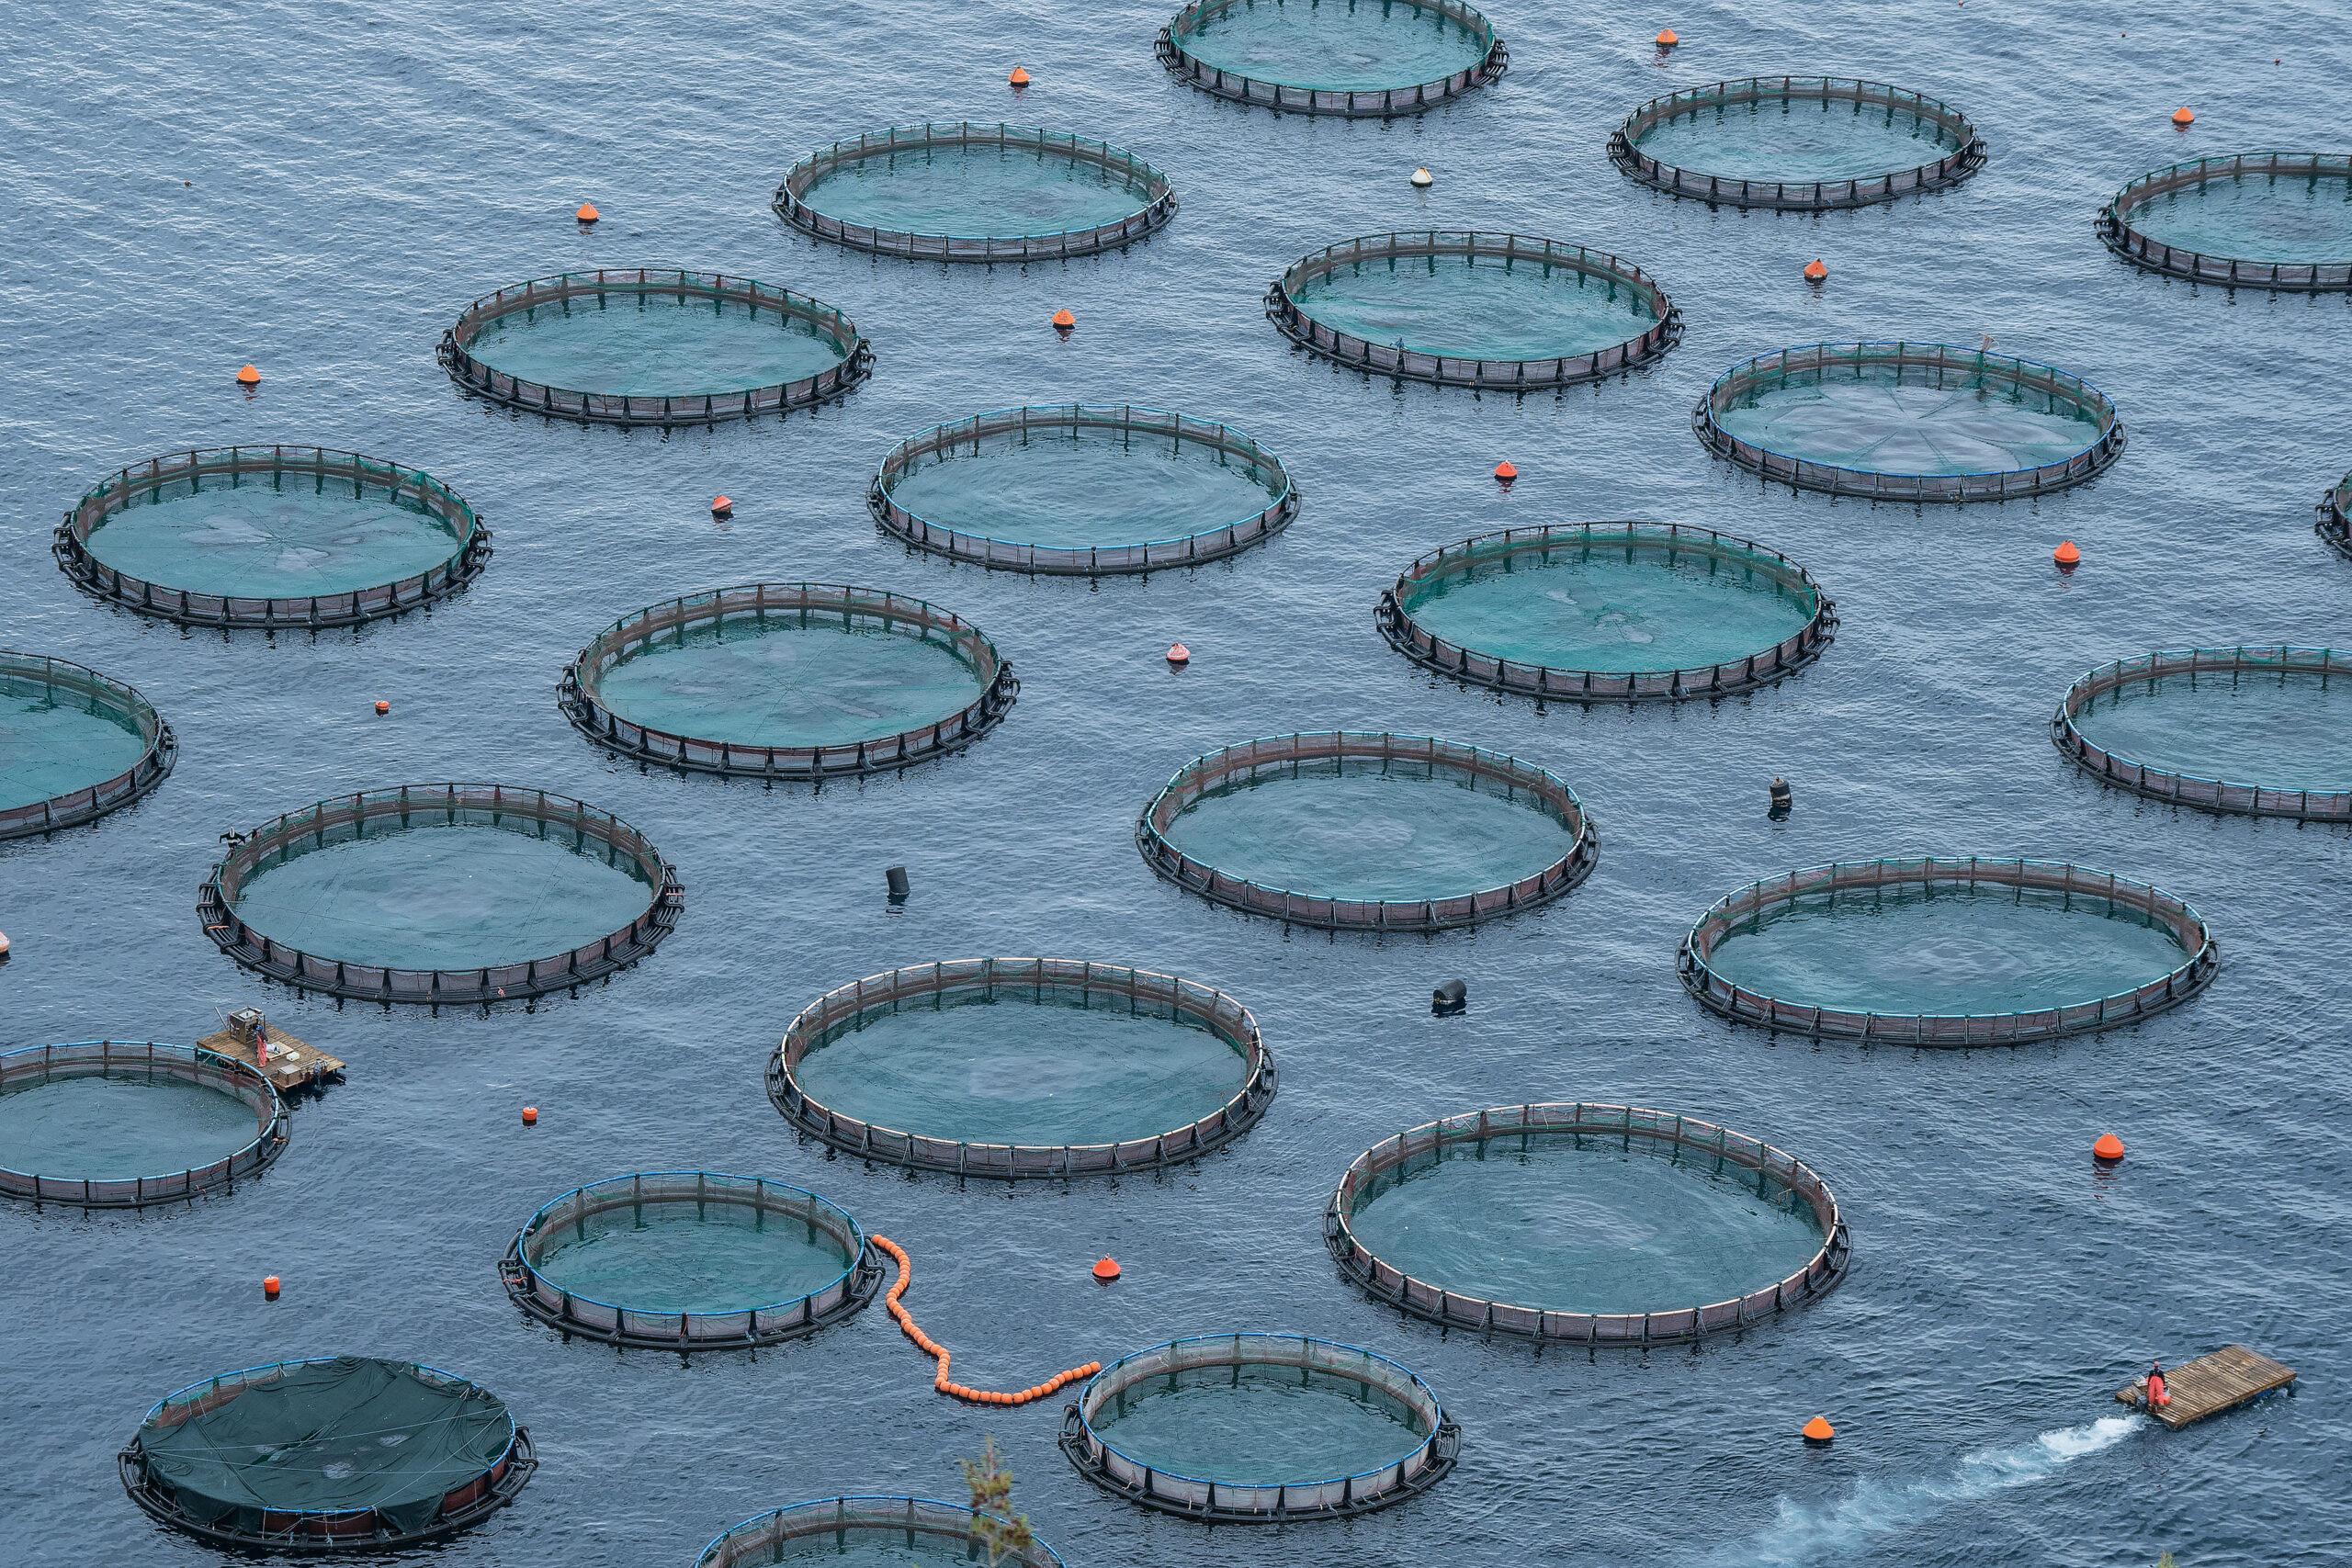 09 Aquaculture Fish Industry Intensive Farm Fishing Sea Aquatic Selene Magnolia 2020 10 28 281412livchiusi